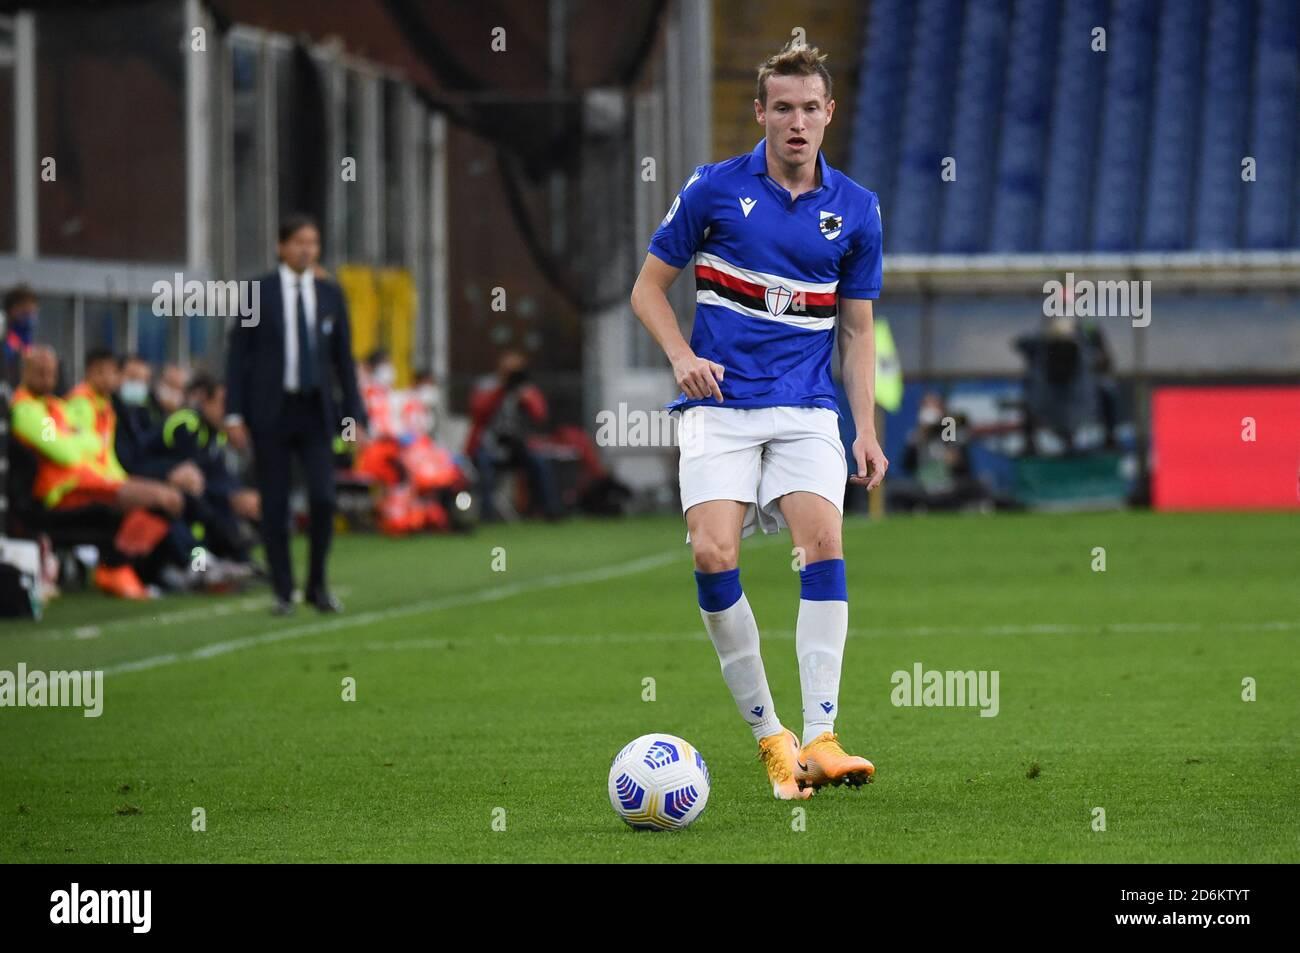 AKUB JANKTO (Sampdoria) during Sampdoria vs SS Lazio , italian soccer Serie A match, Genova, Italy, 17 Oct 2020 Credit: LM/Danilo Vigo Stock Photo